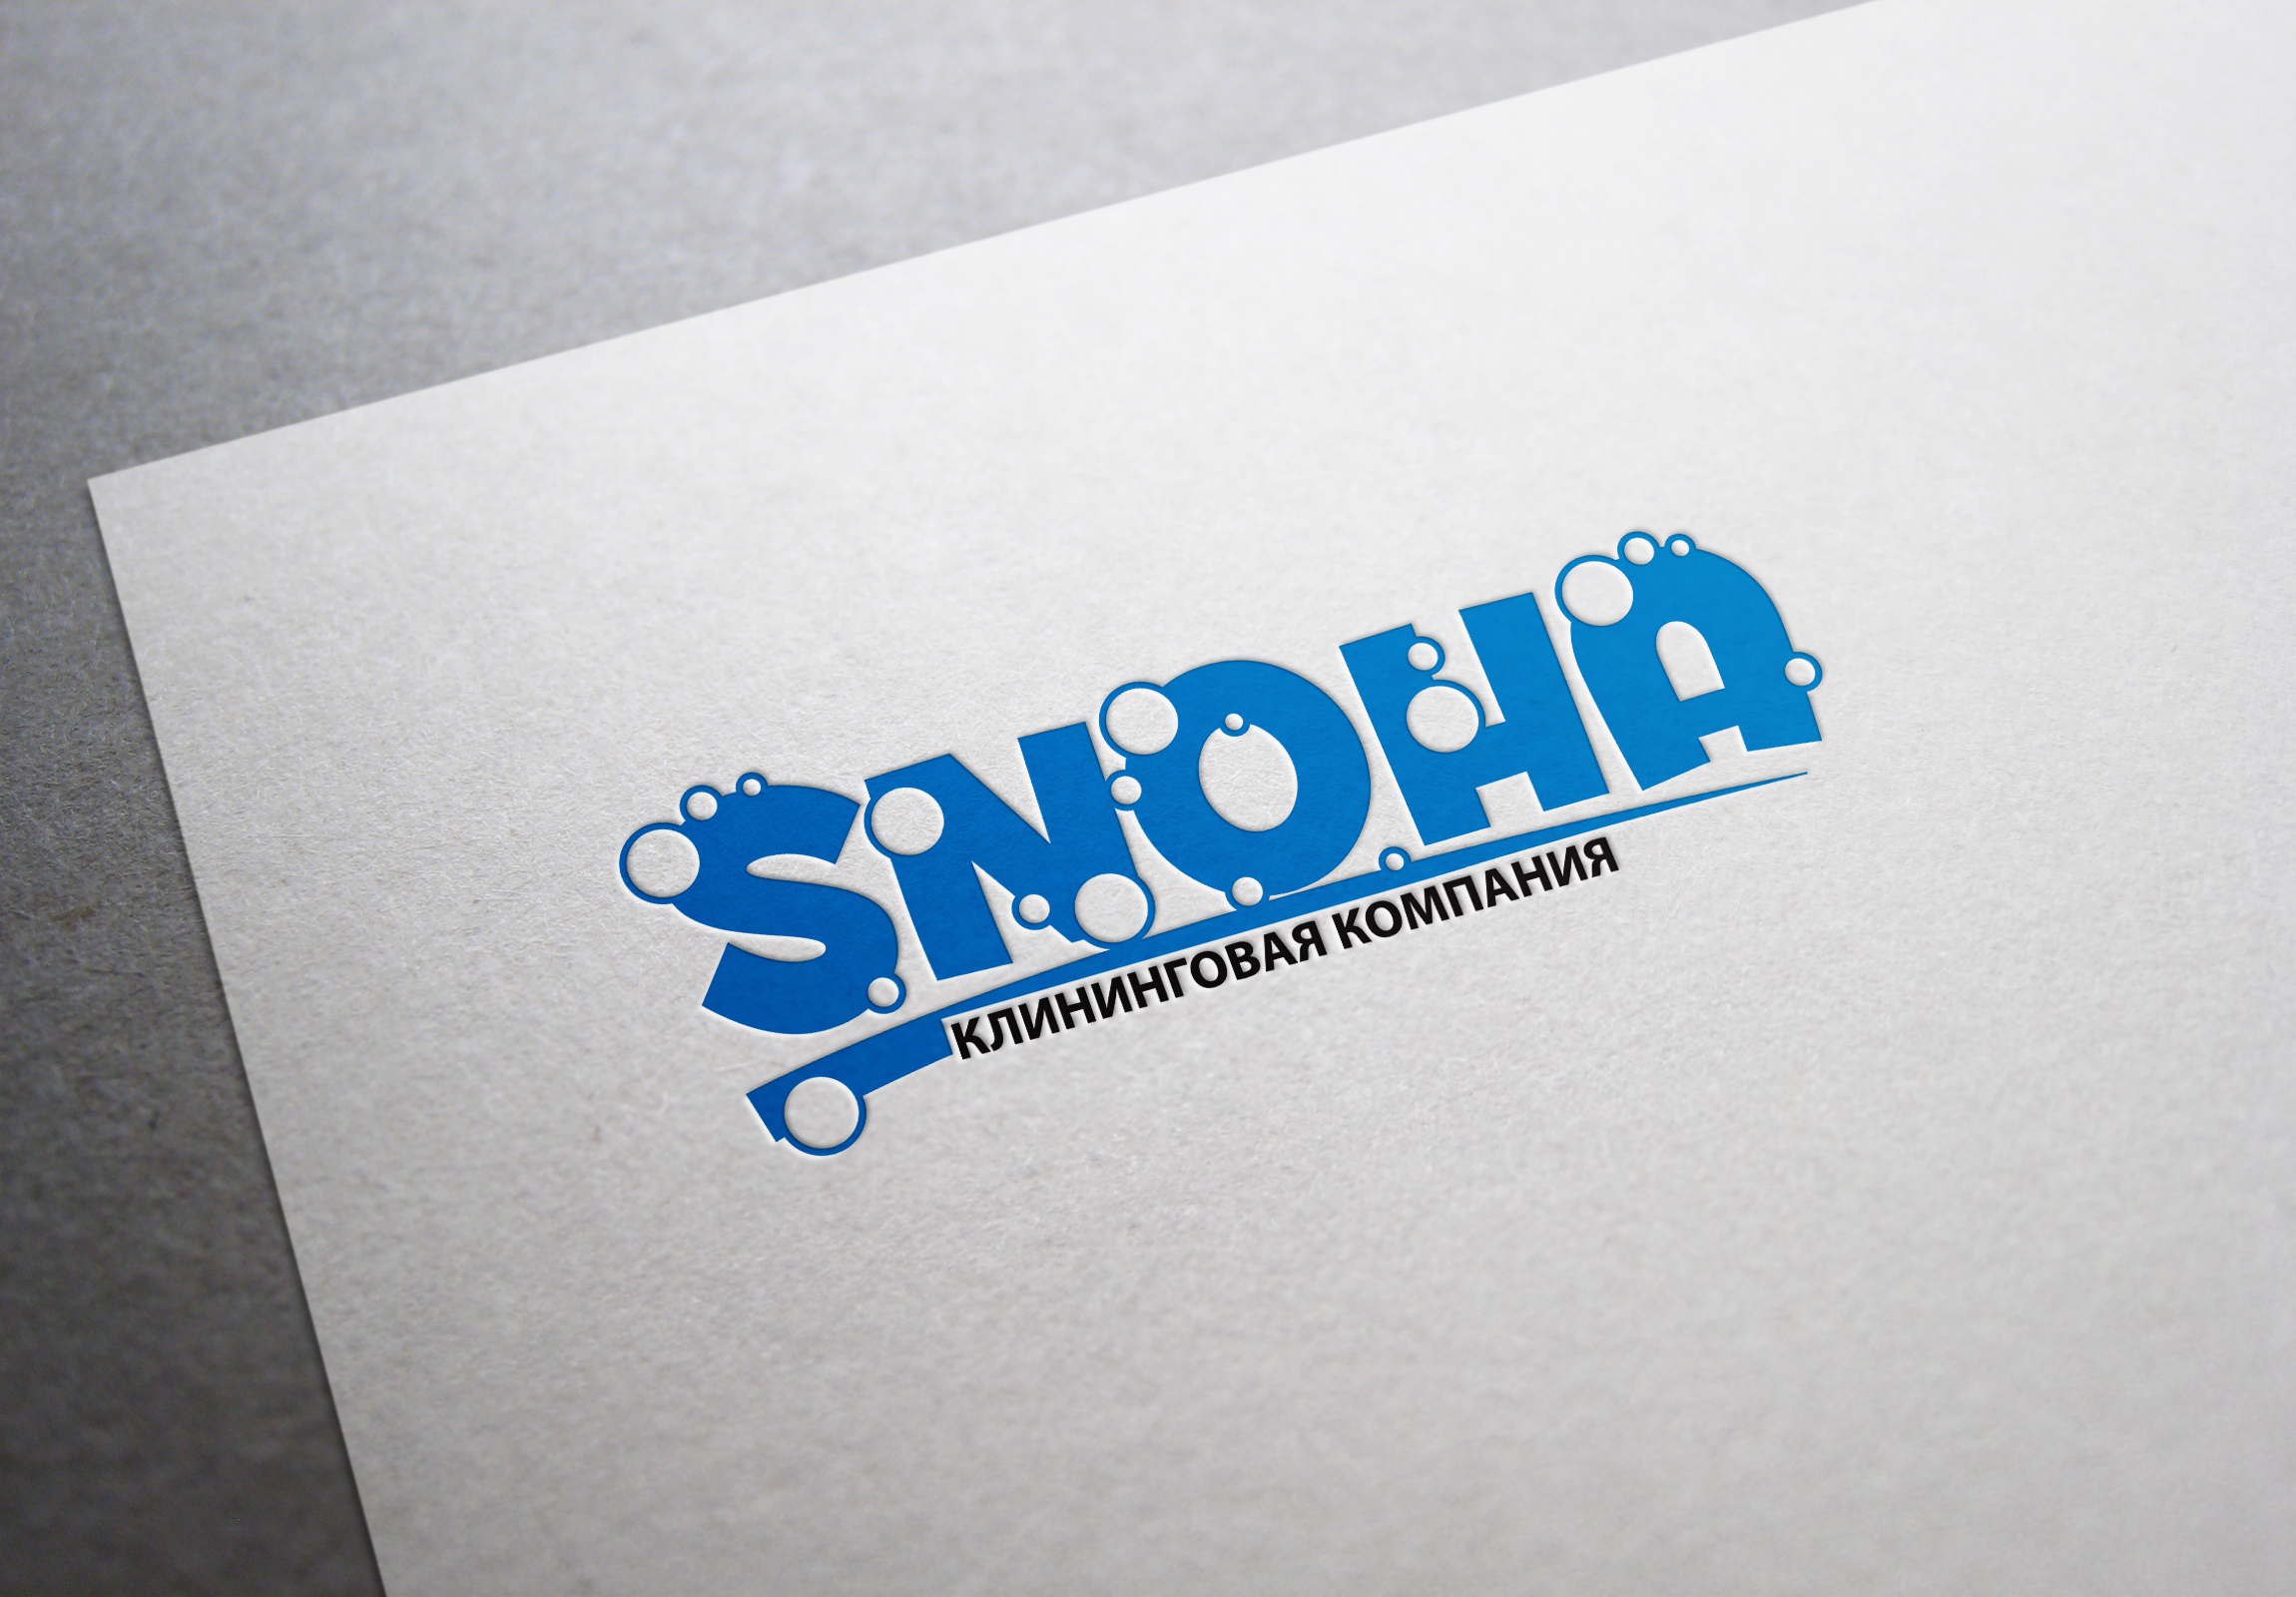 Логотип клининговой компании, сайт snoha.ru фото f_47854a16aa9cb5fa.jpg